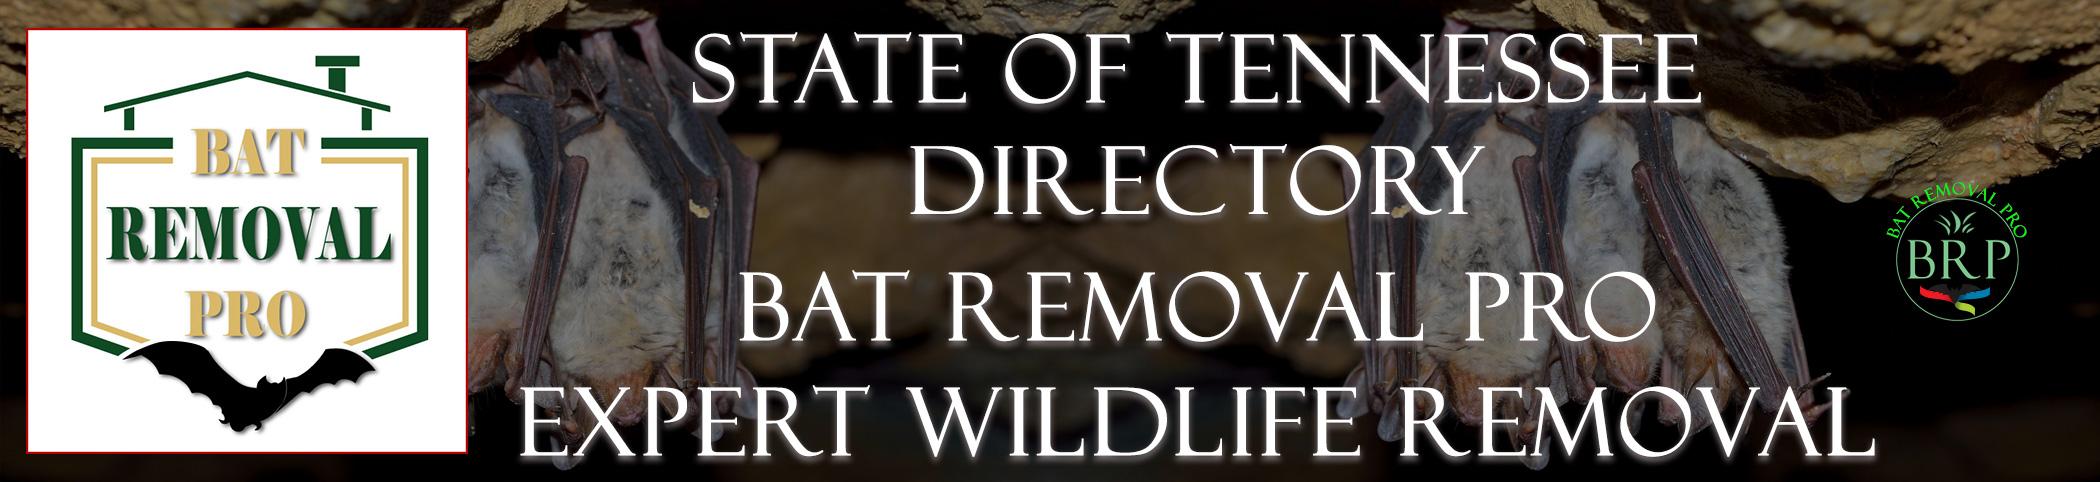 tennessee-bat-removal-at-bat-removal-pro-header-image